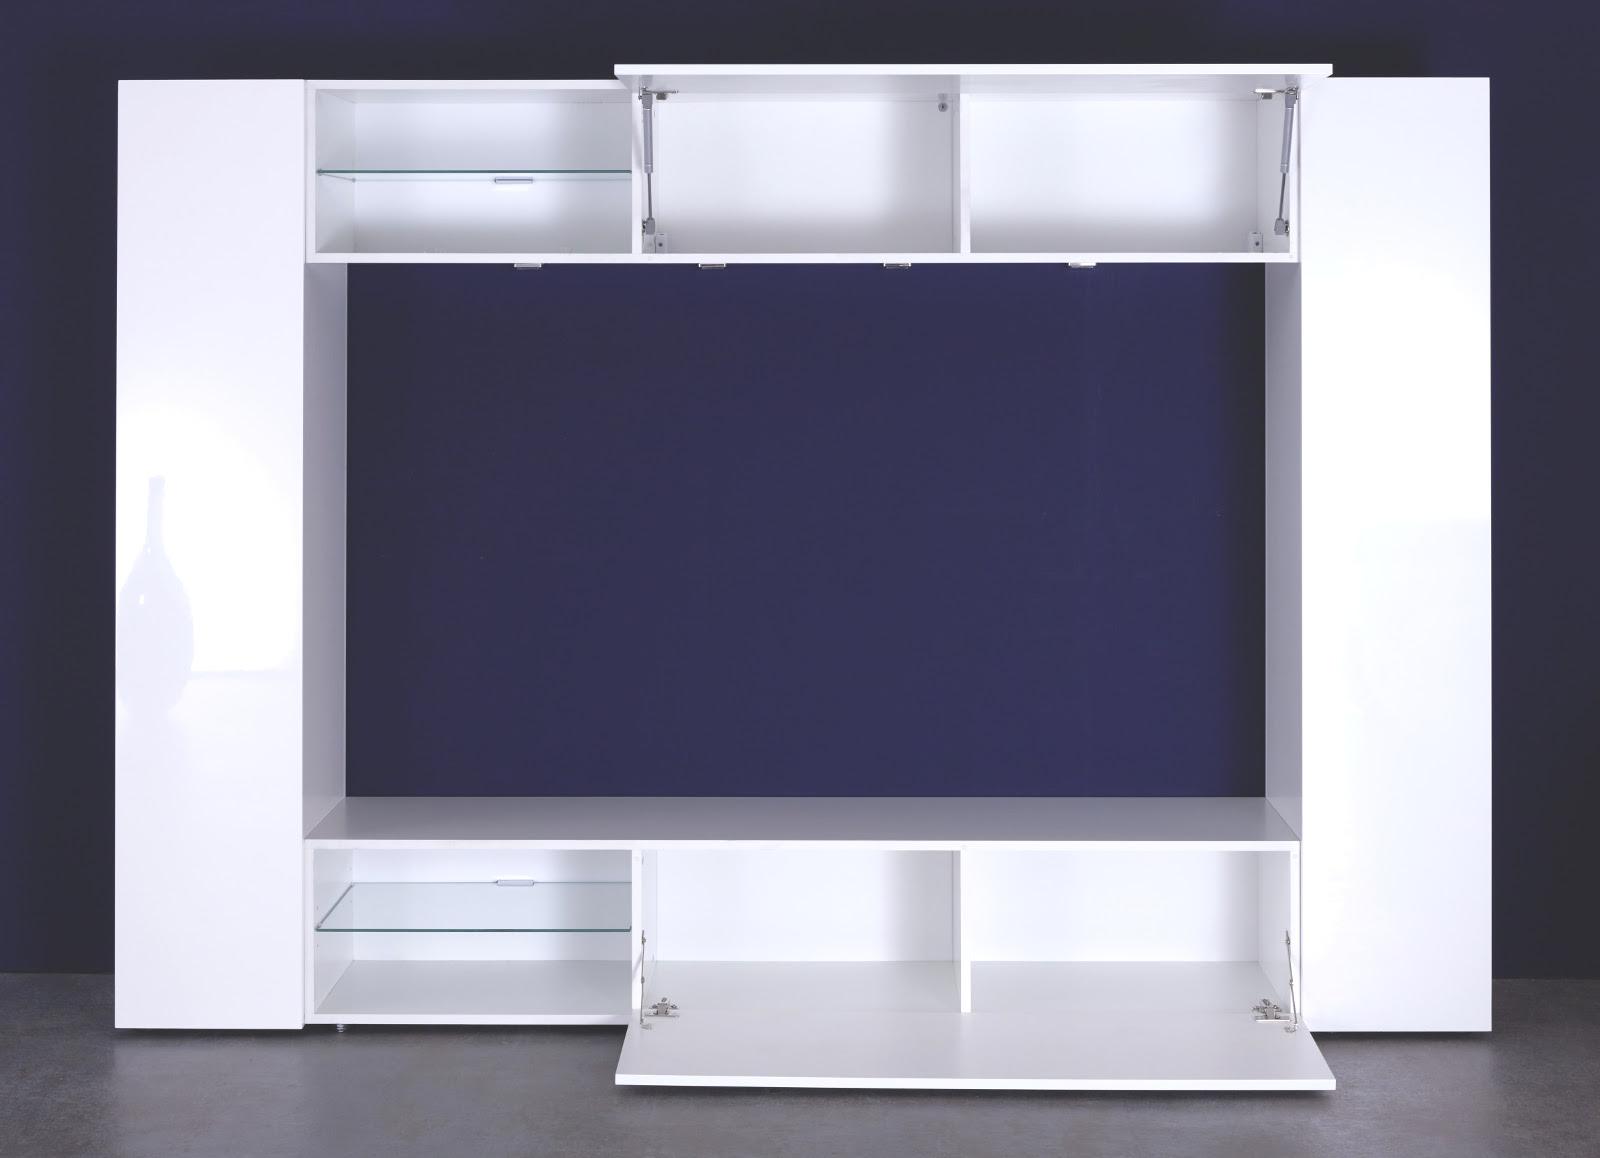 medienwand wei hochglanz inkl led beleuchtung. Black Bedroom Furniture Sets. Home Design Ideas